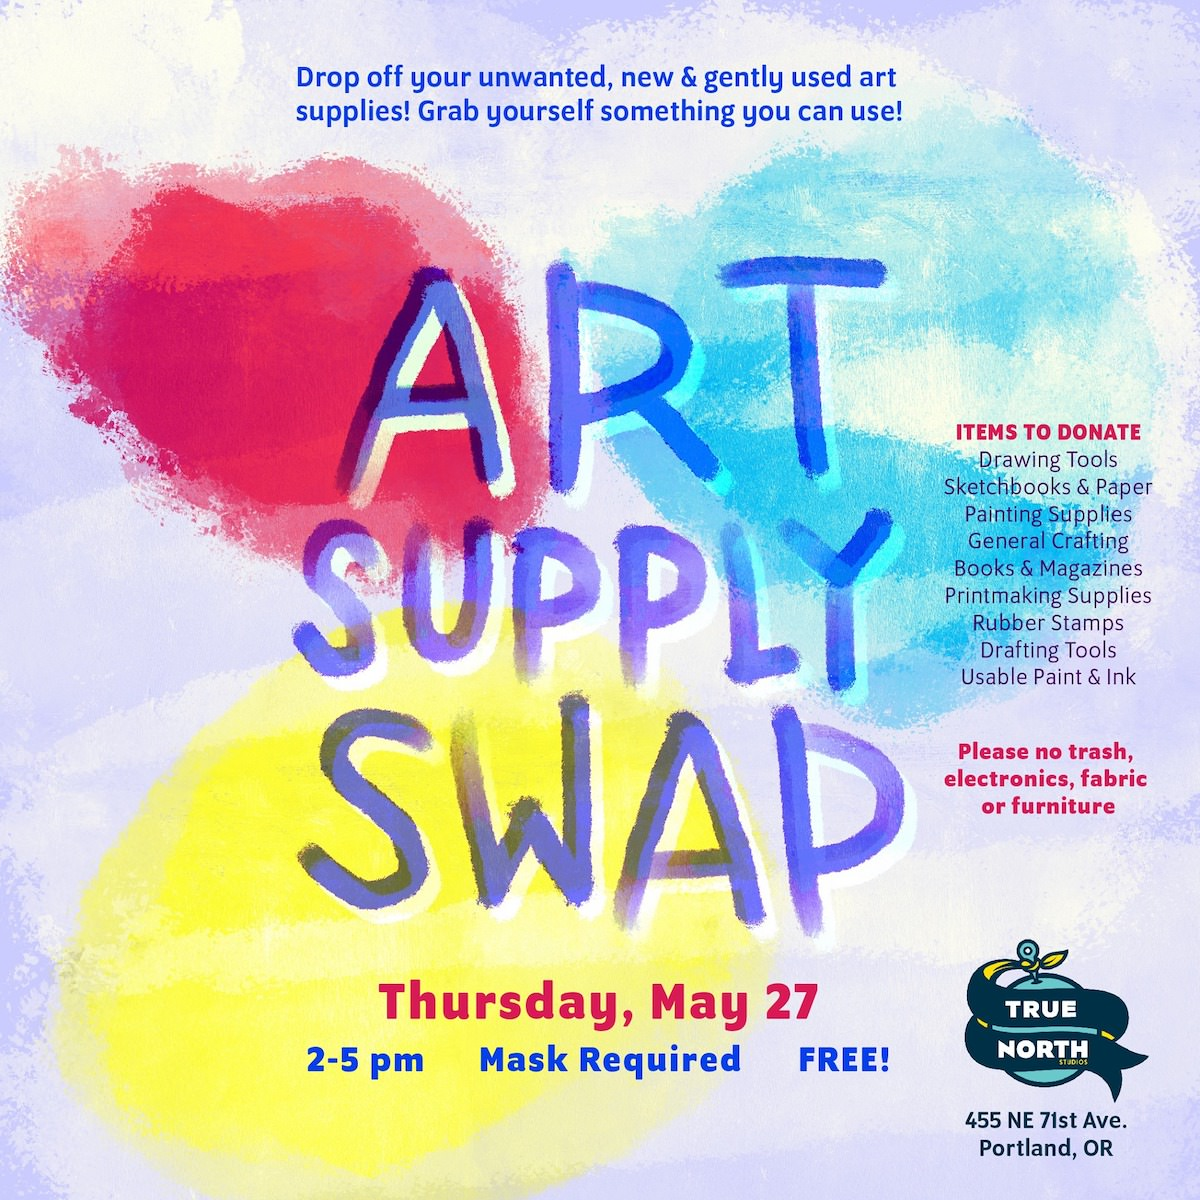 Art Supply Swap Today